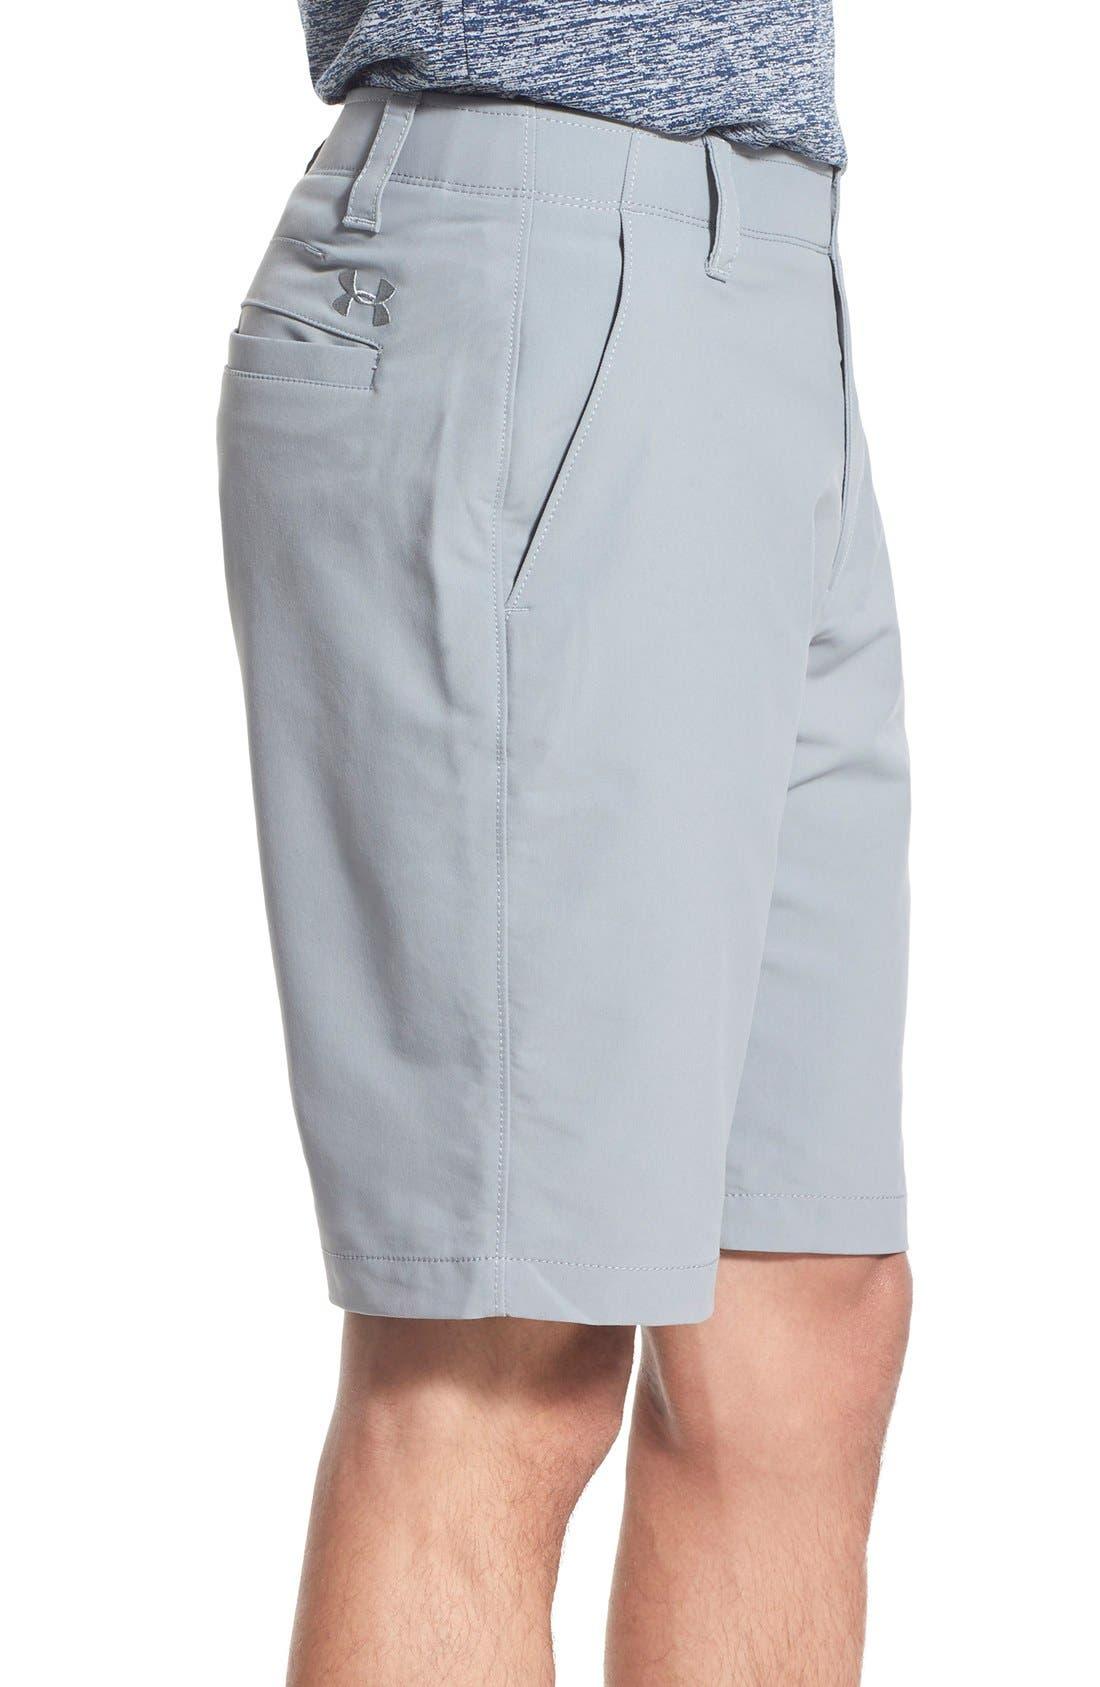 'Matchplay' Moisture Wicking Golf Shorts,                             Alternate thumbnail 3, color,                             035